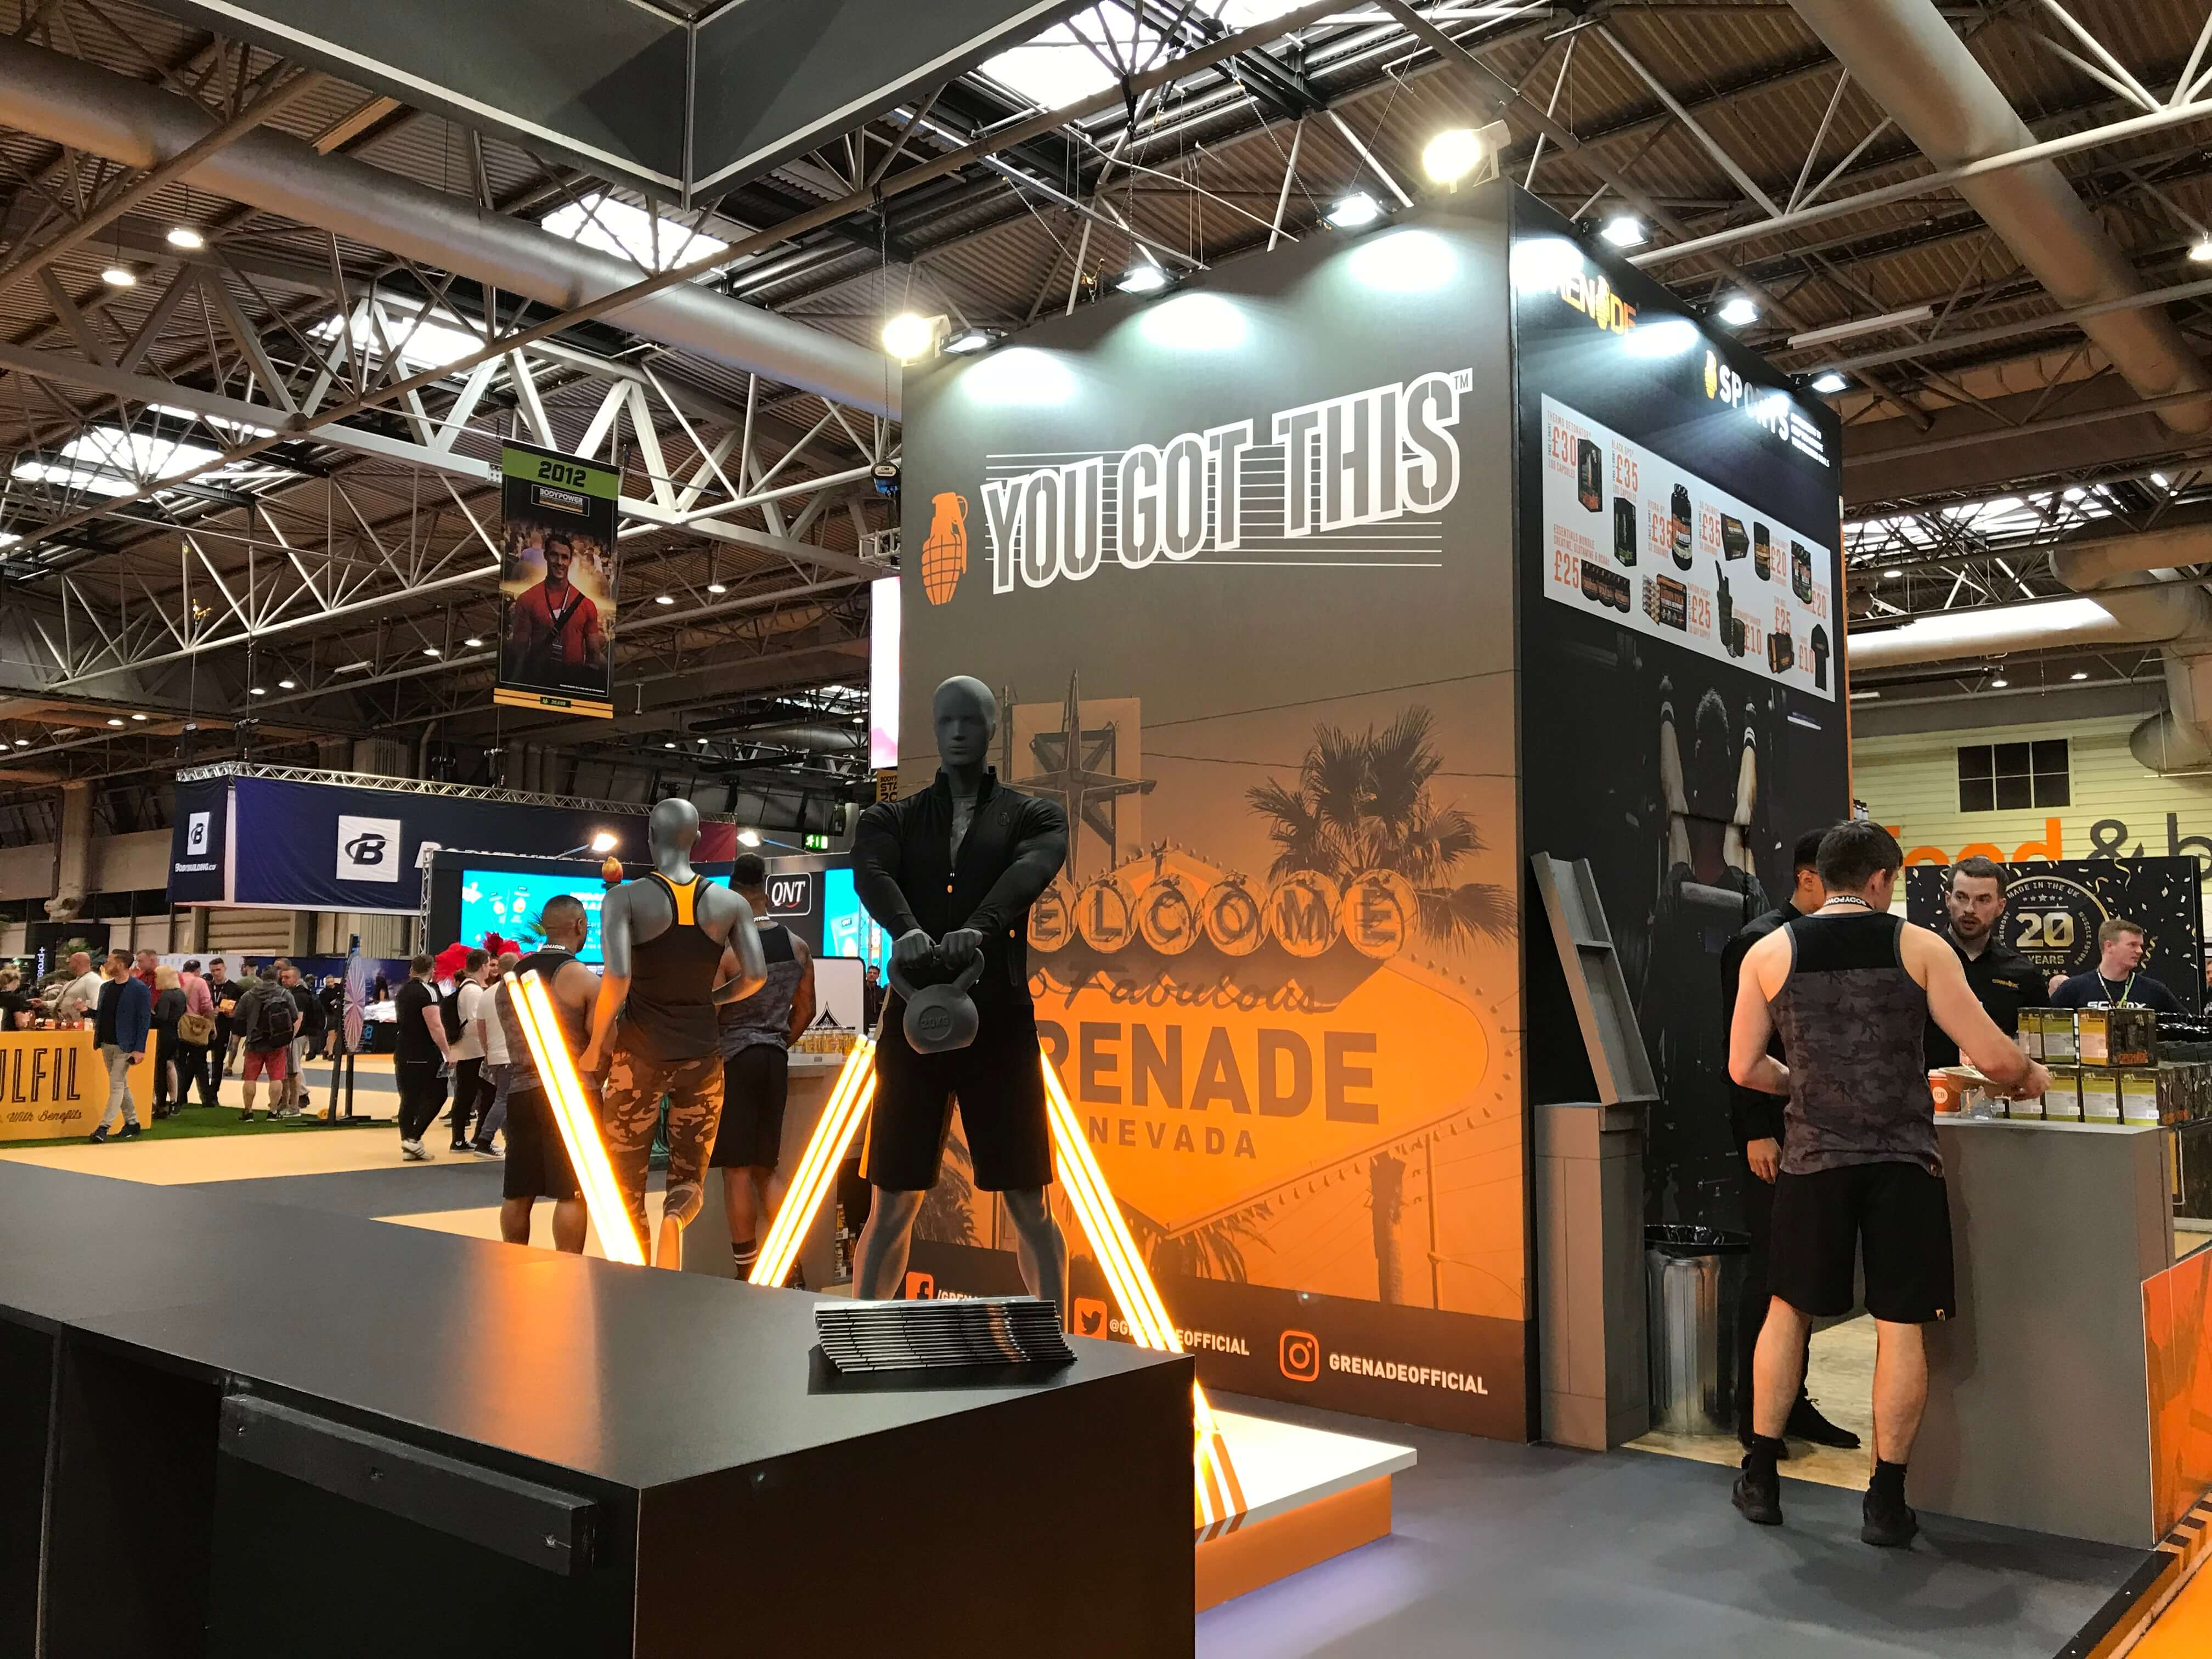 Grenade Body Powr Sport Show Stand Designs Manchester (1)